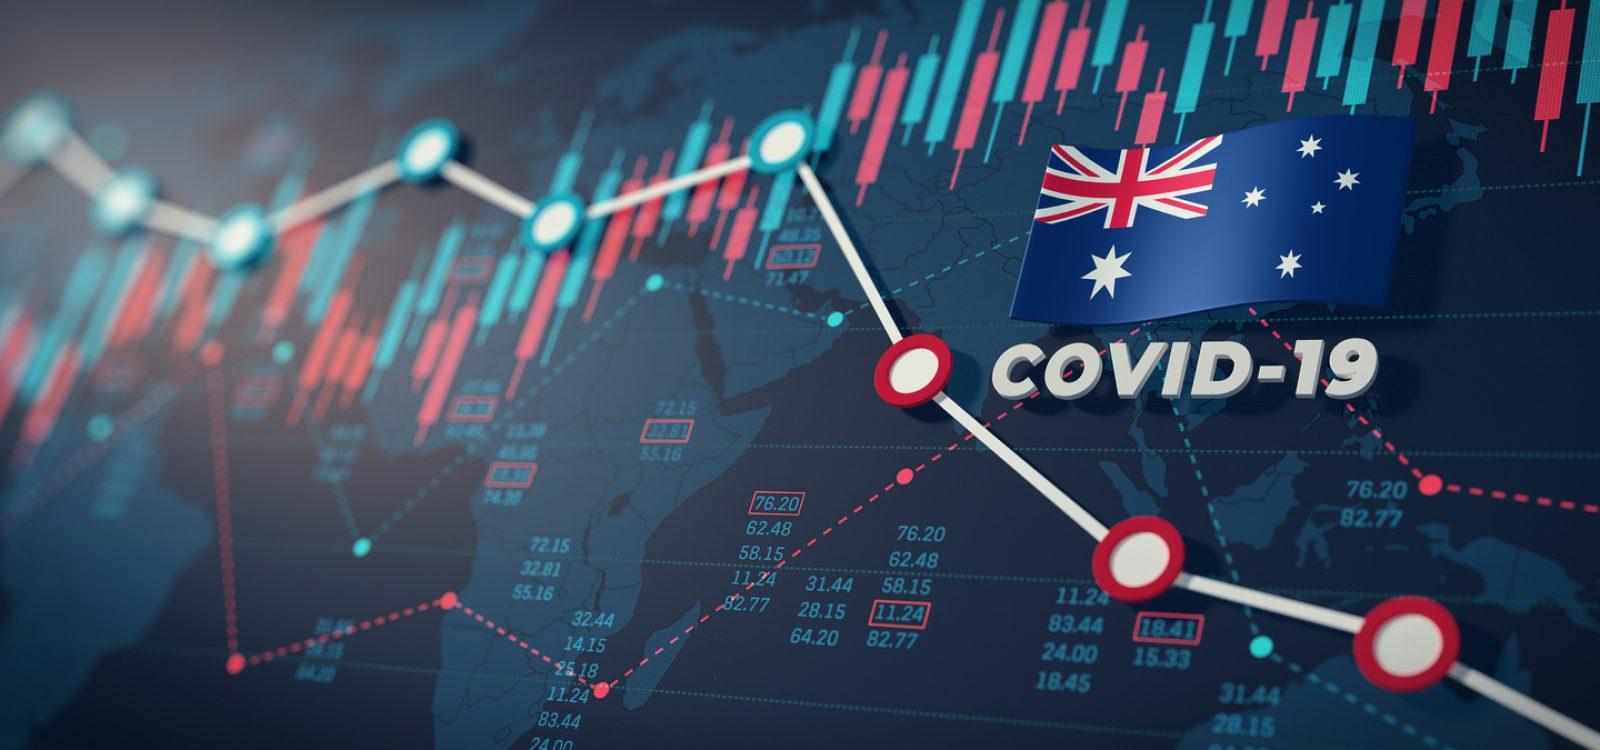 Update on Mortality in Australia